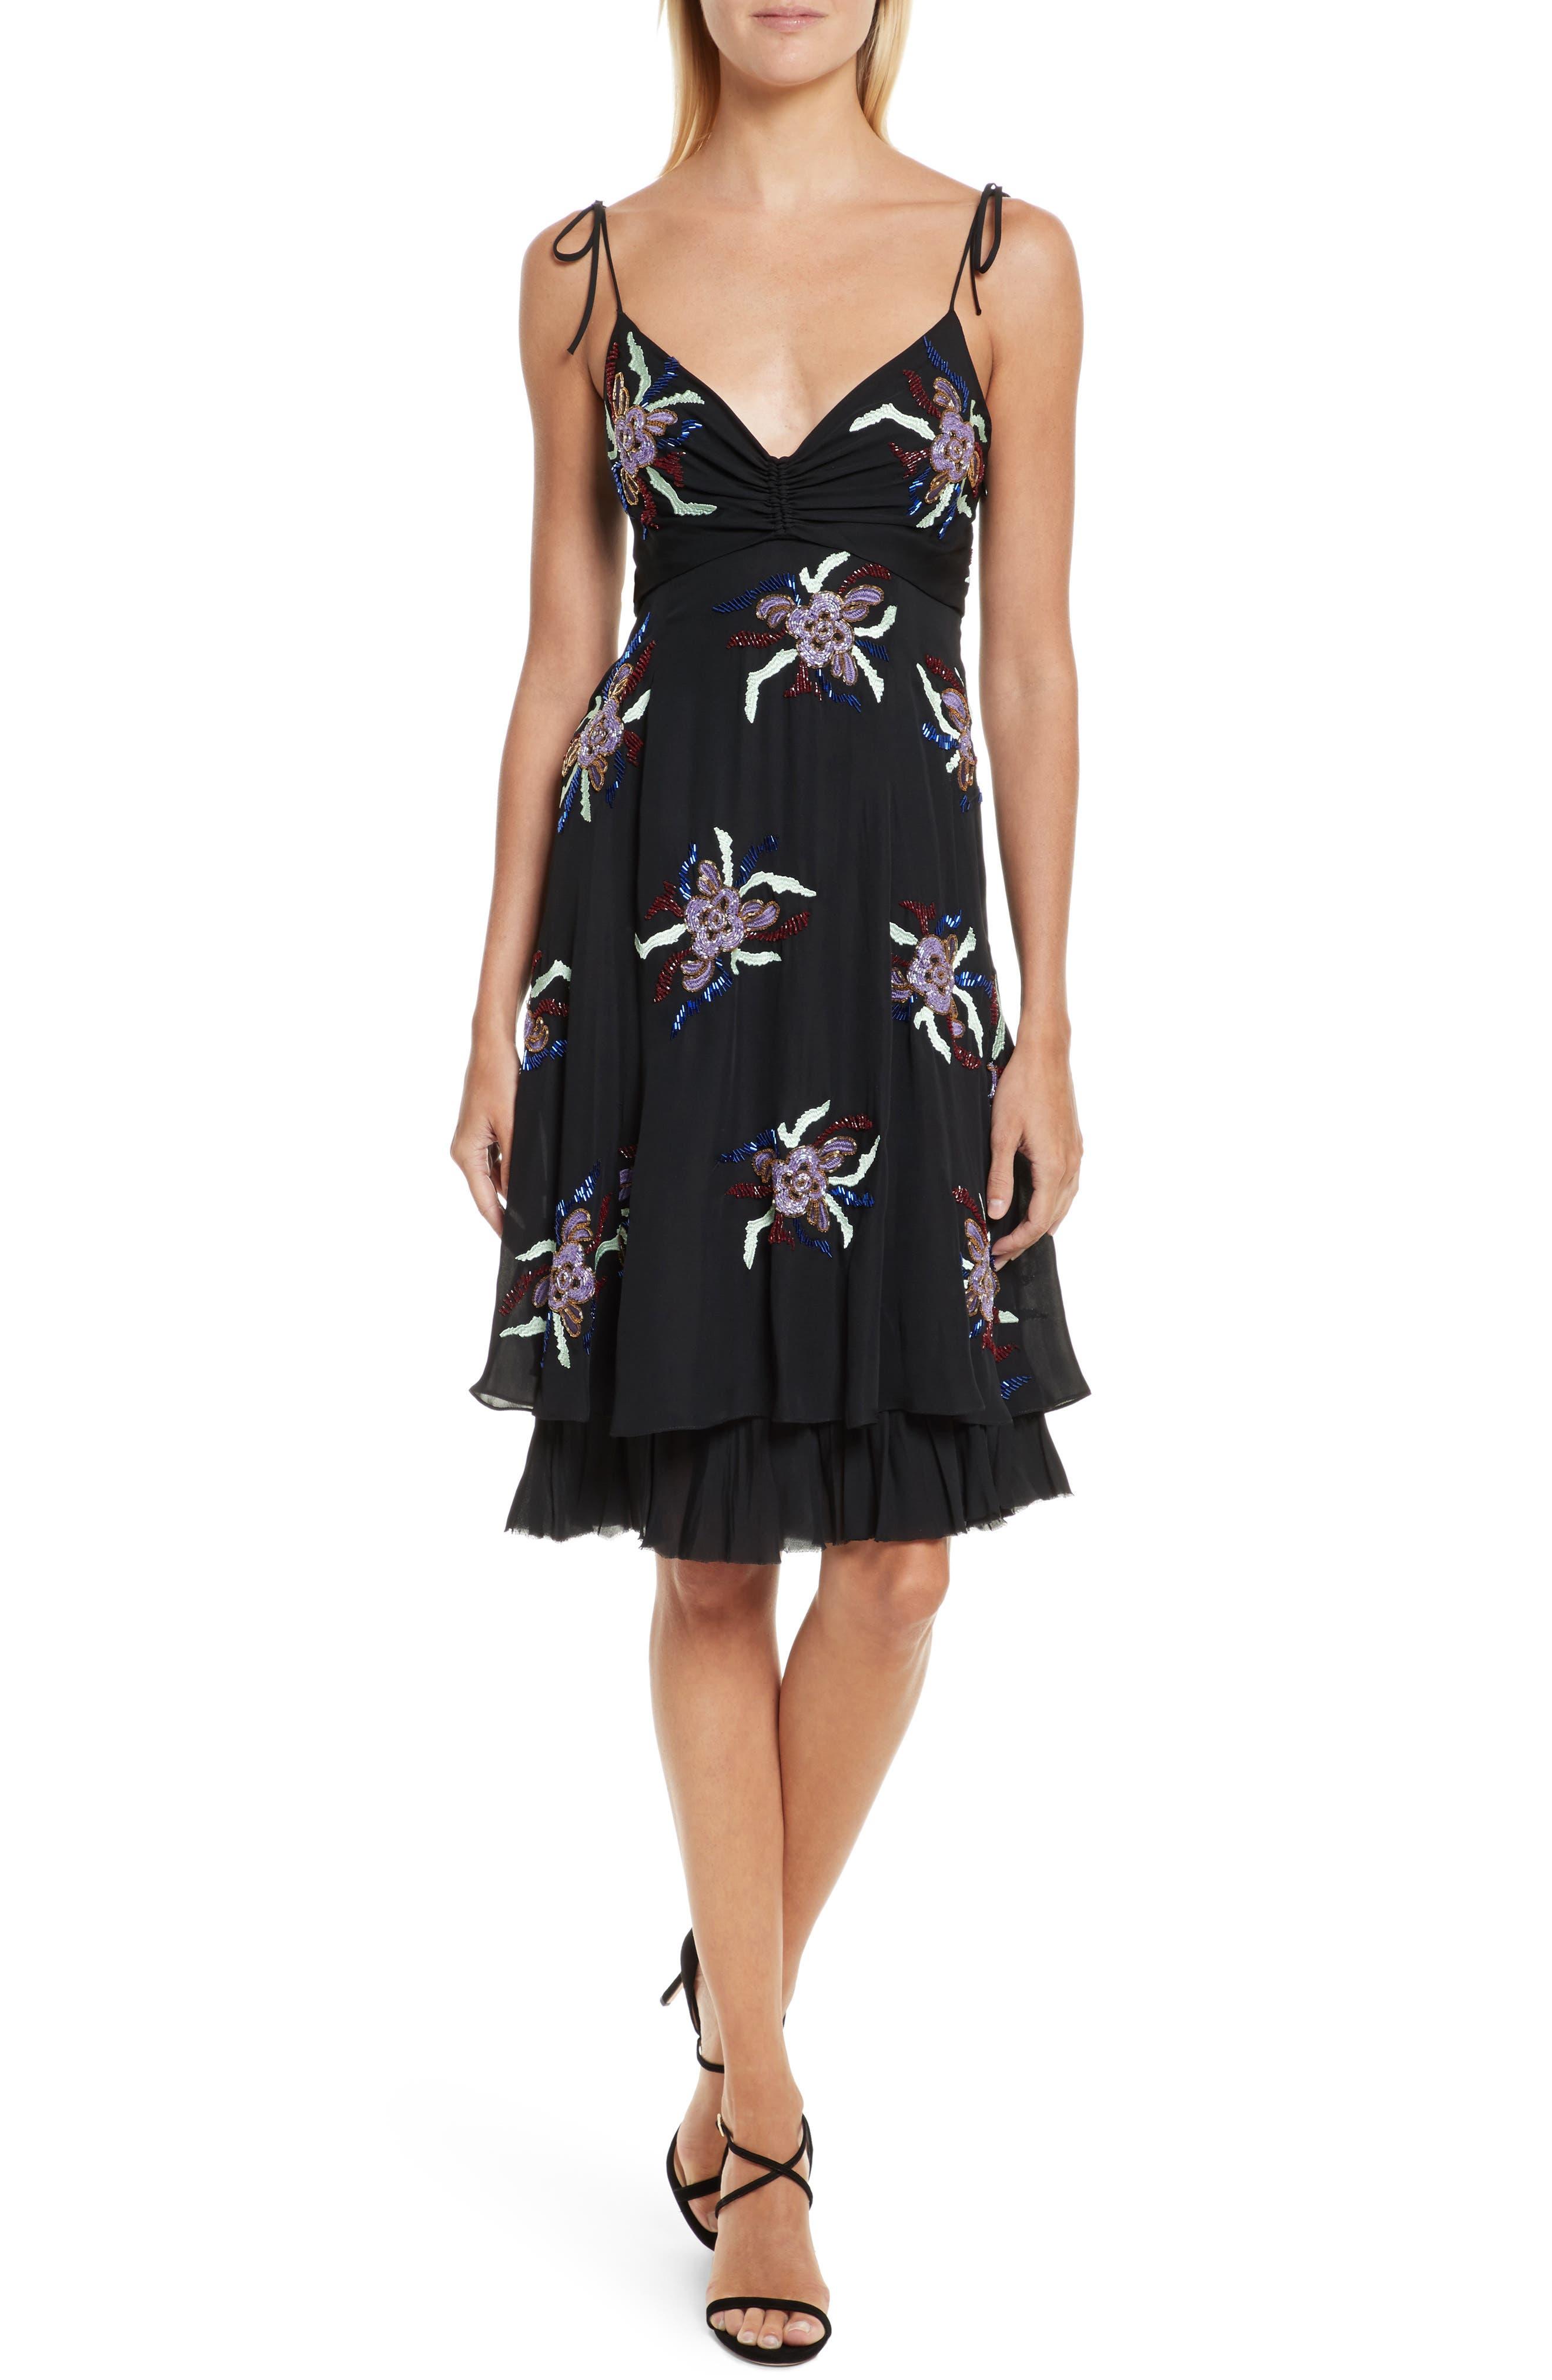 Porsca Embellished Silk Dress,                             Main thumbnail 1, color,                             008